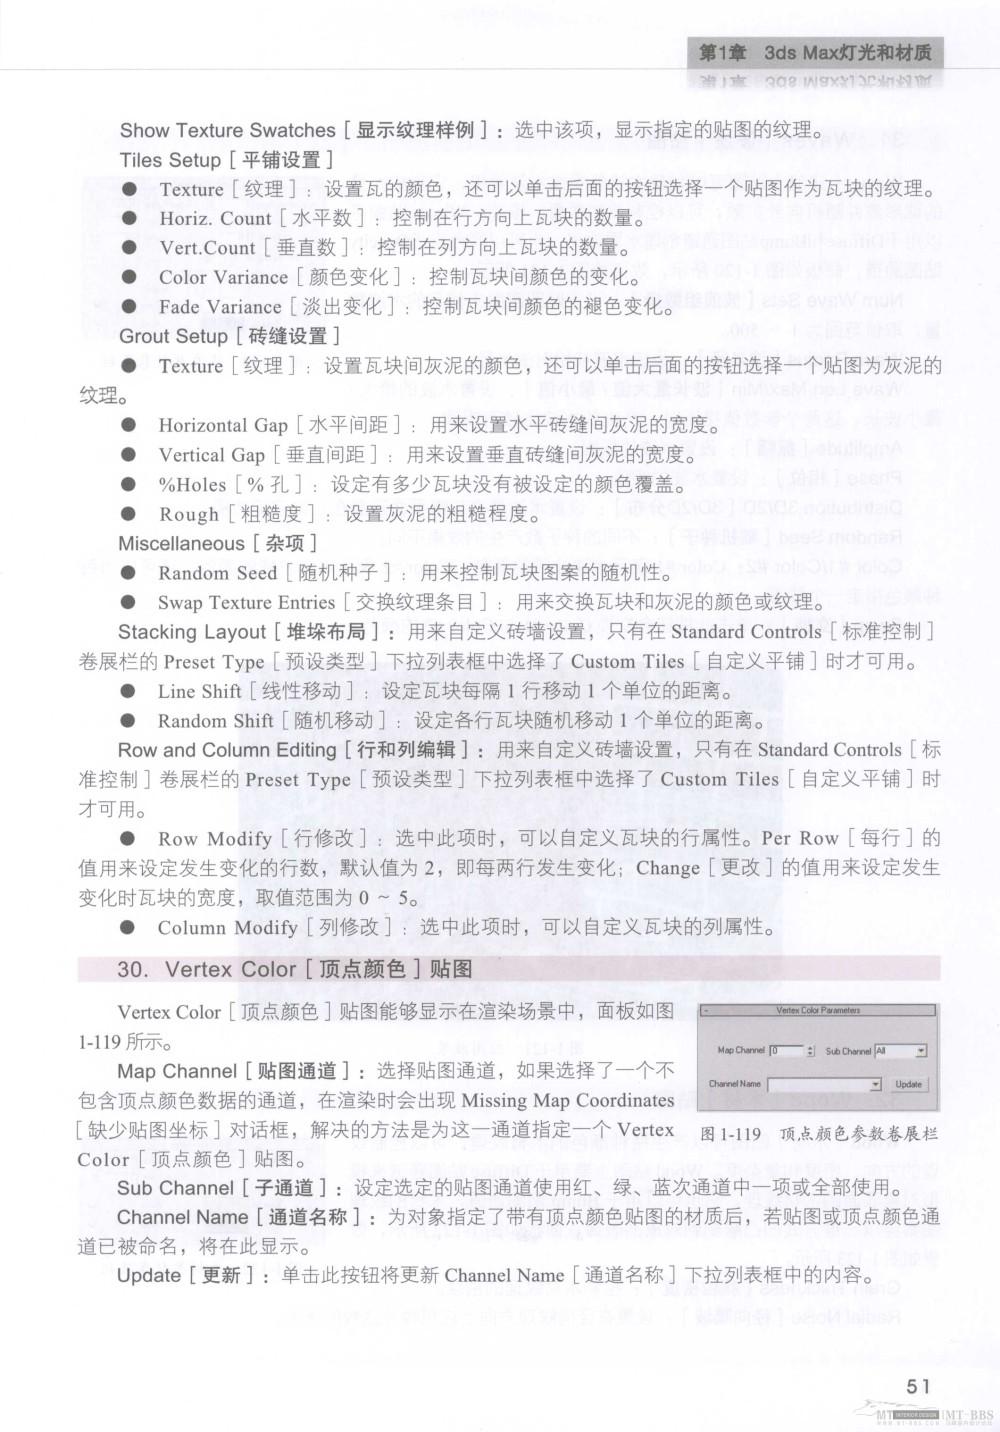 水晶石技法-3ds_Max&VRay室内空间表现_水晶石技法-3ds_Max&VRay室内空间表现_页面_057.jpg